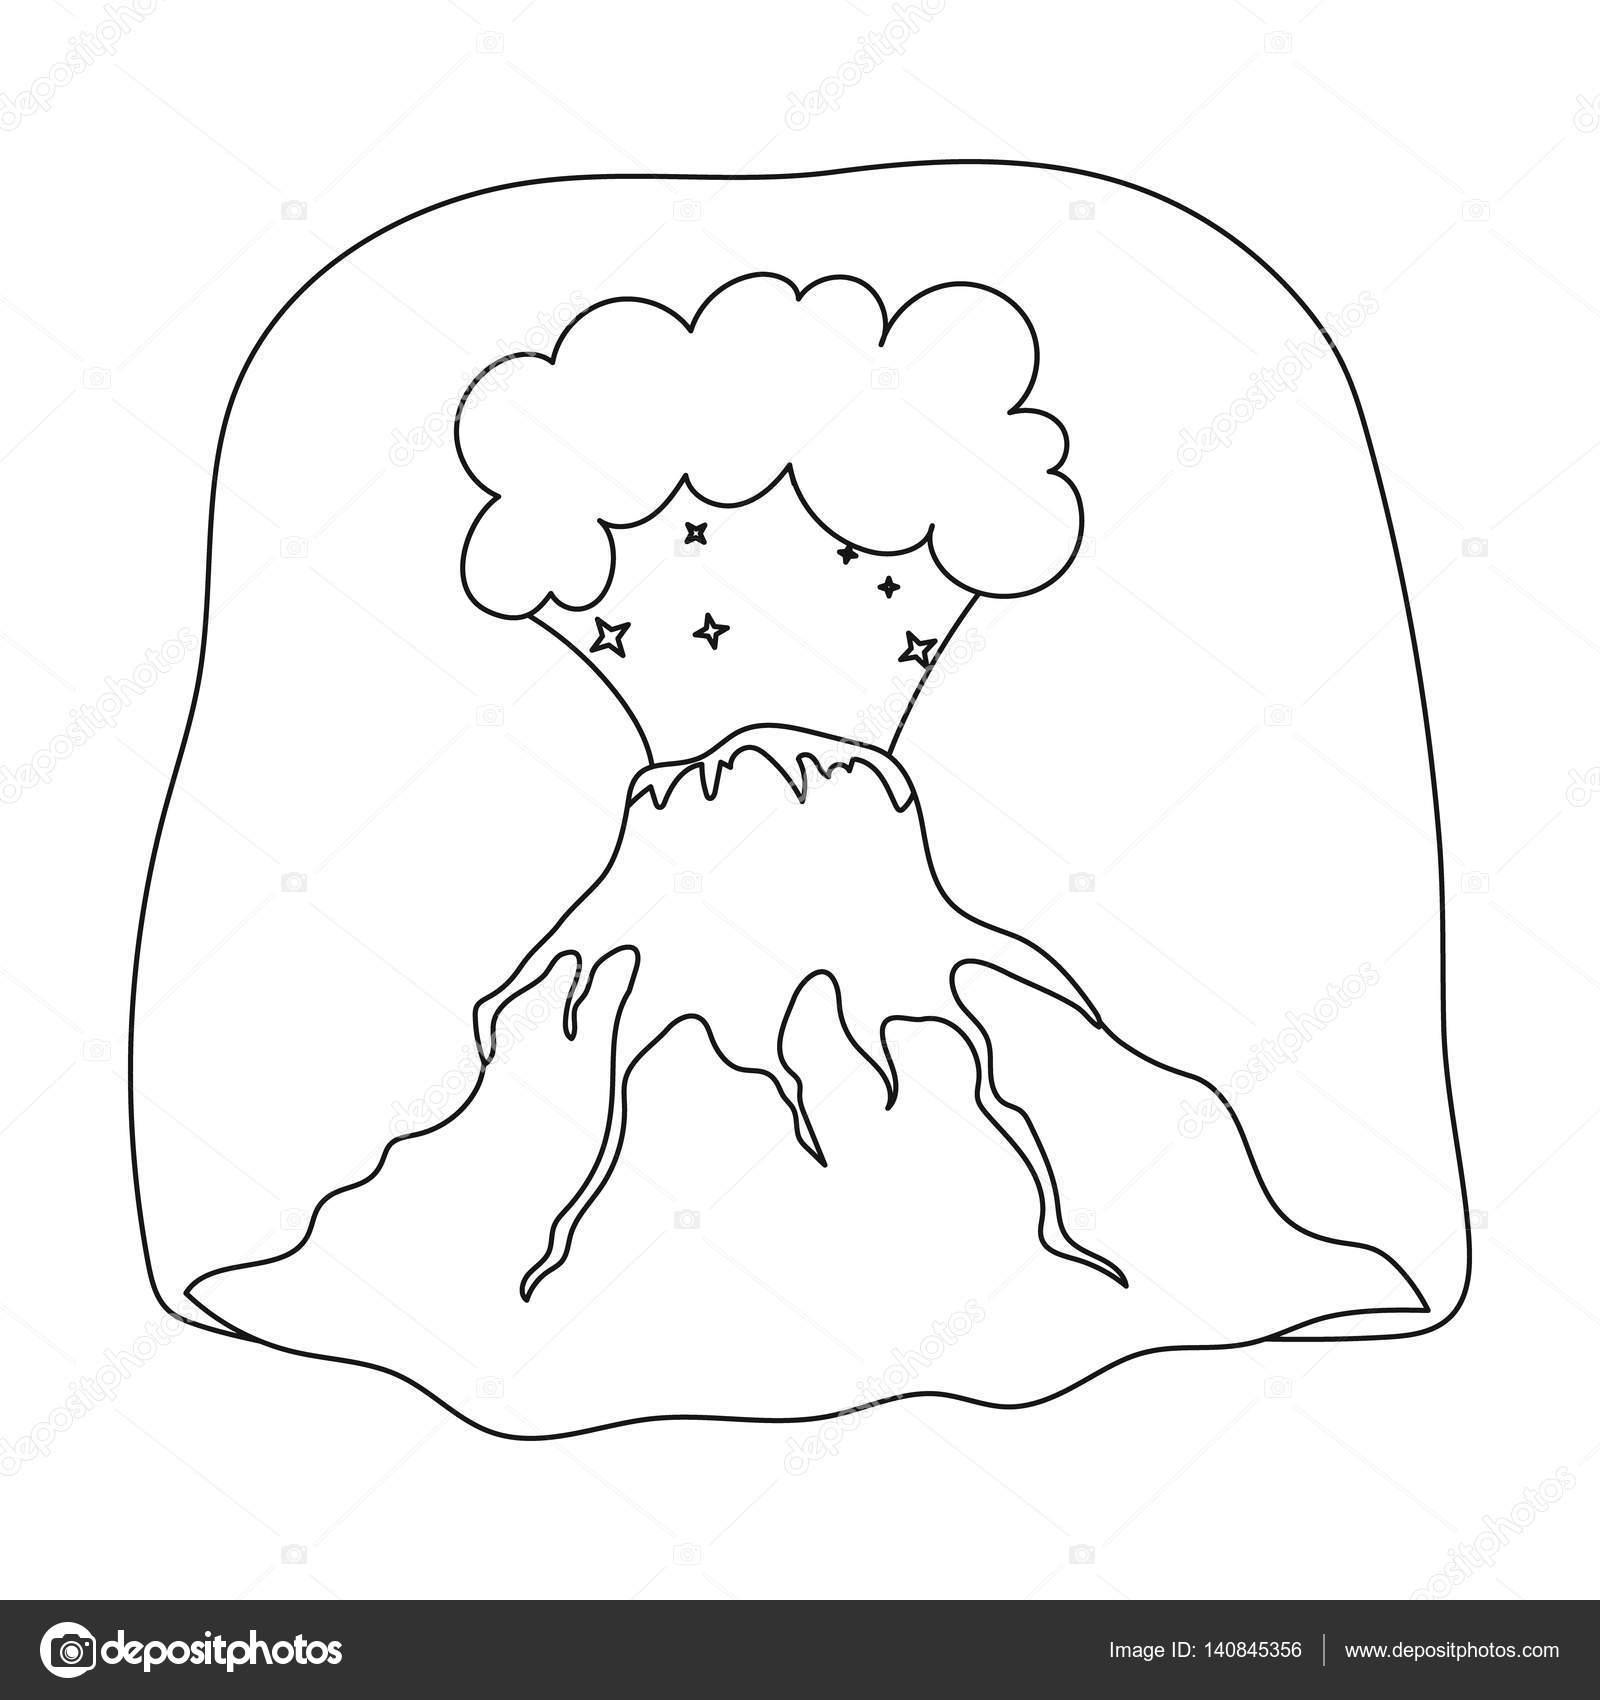 Icono de erupción de volcán en contorno estilo aislado sobre fondo ...